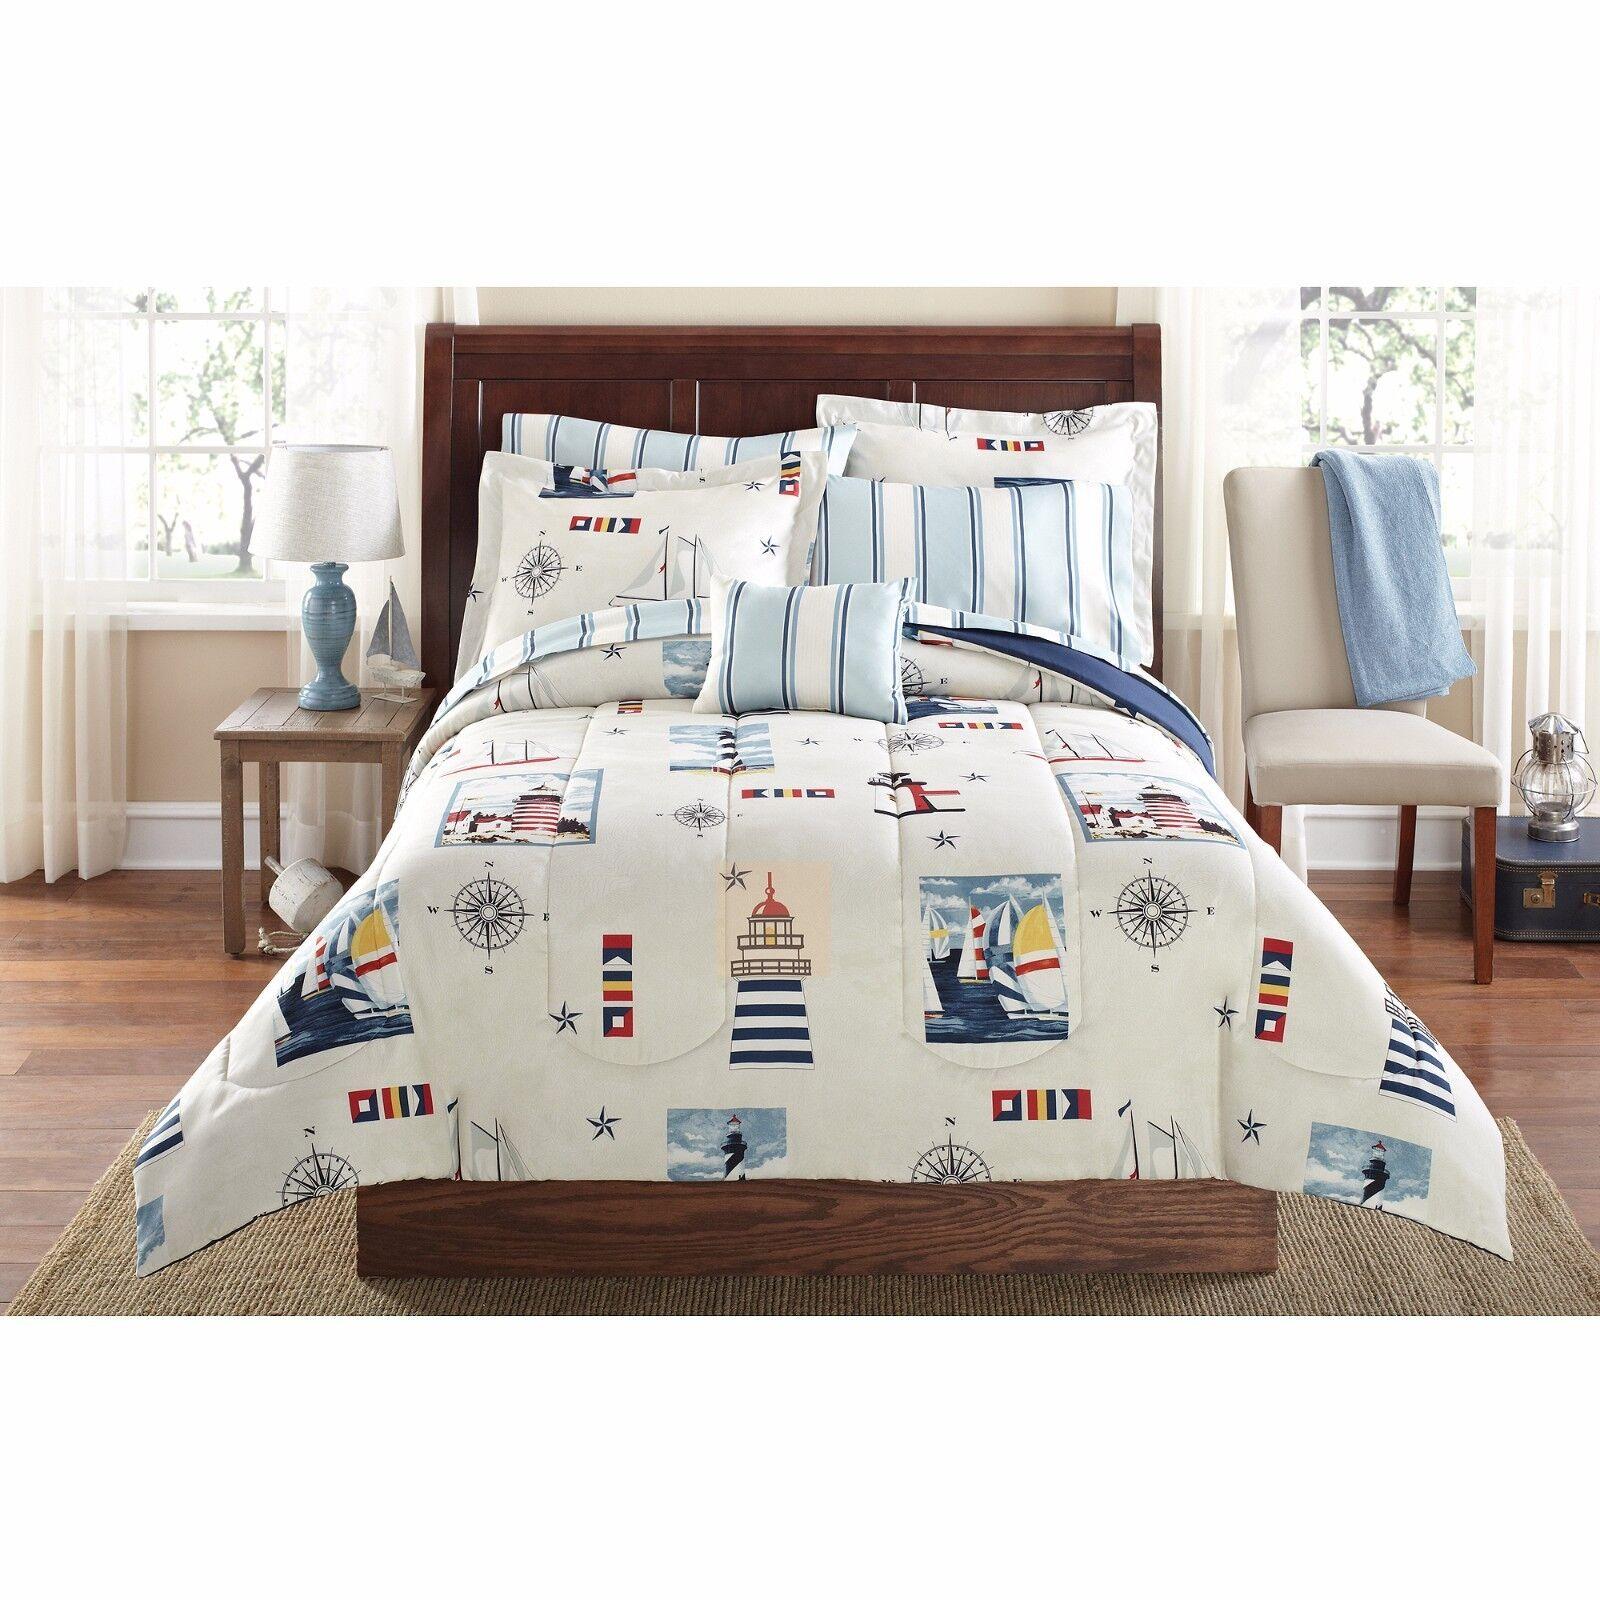 Nautical Comforter Set Sheet Set Twin XL 8 PCs Flag Navy Star Maritime Bedding